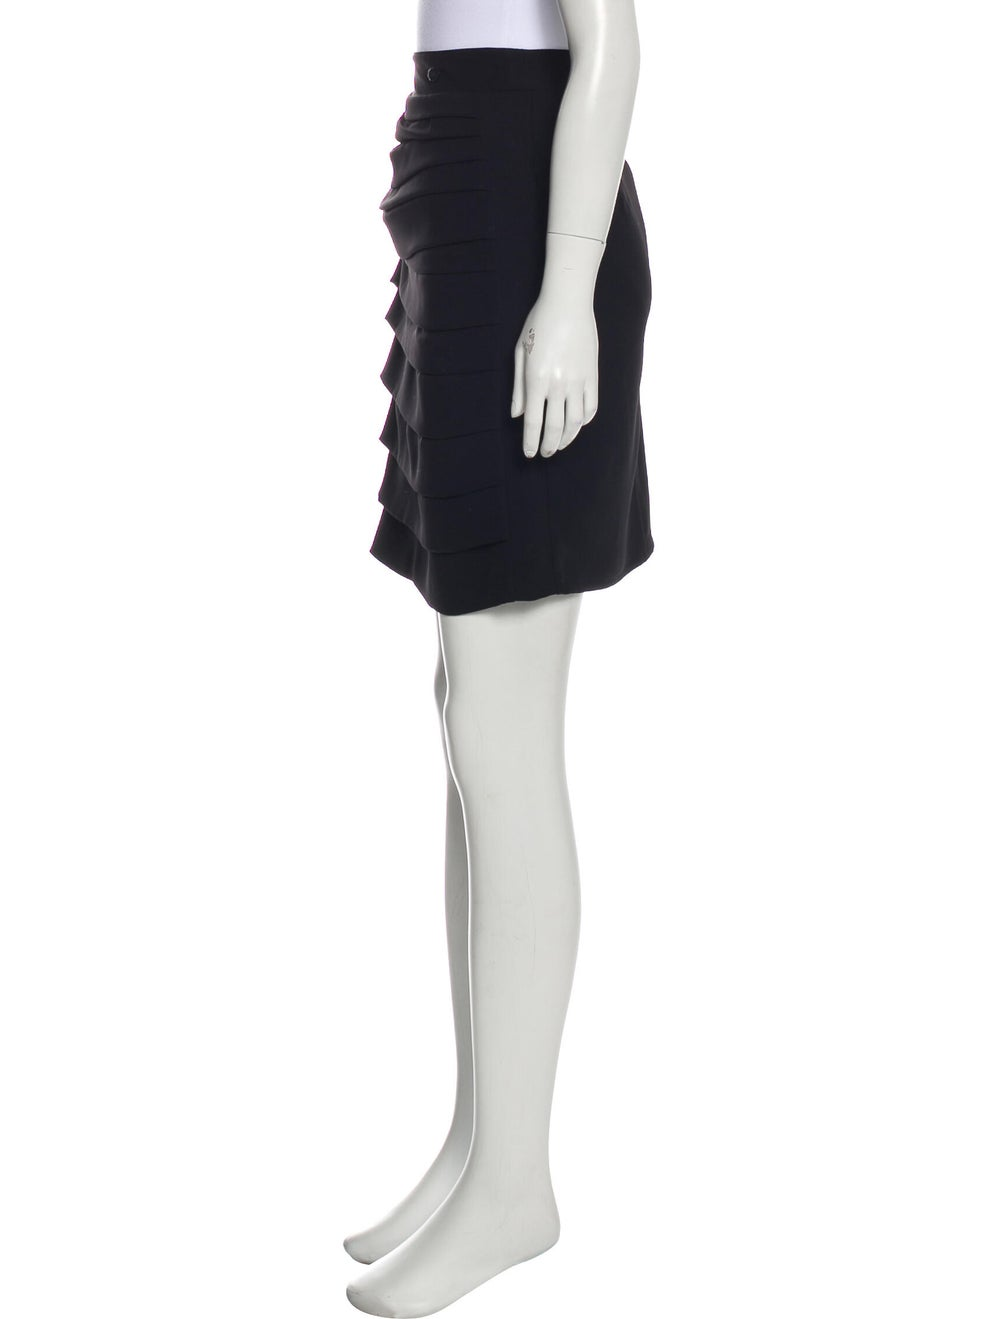 Chanel Paris-Shanghai Tiered Skirt Black - image 2